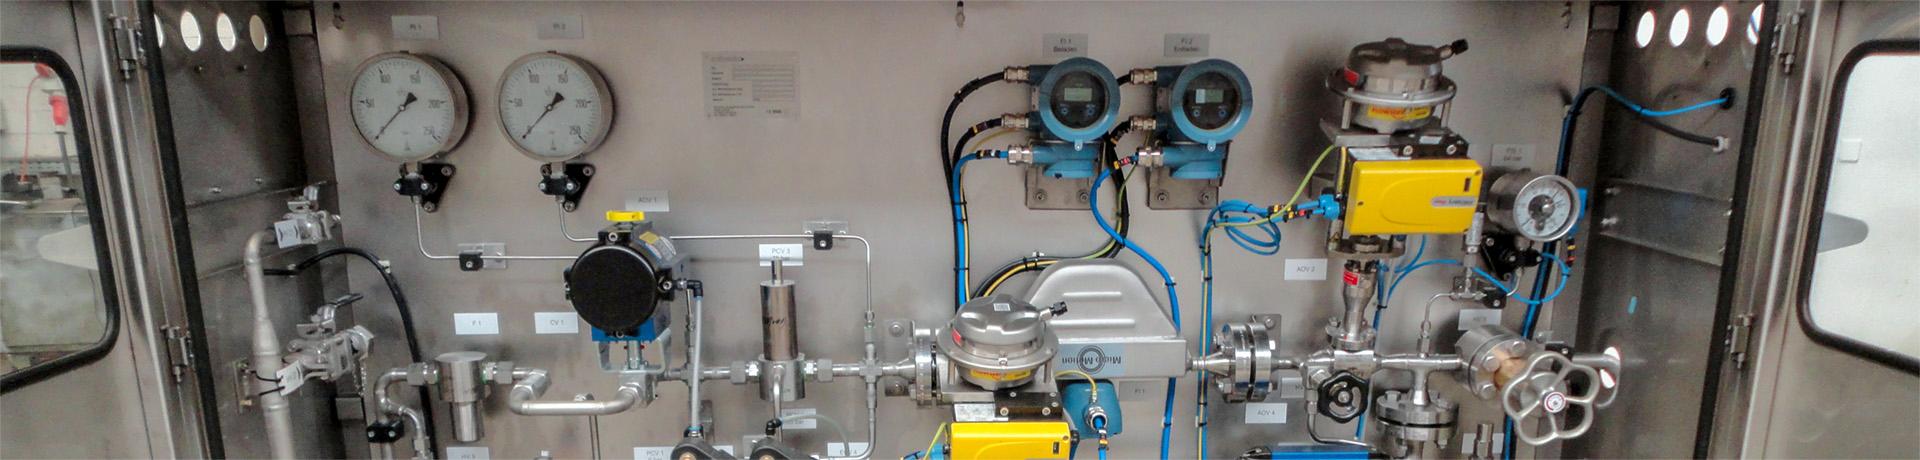 Gas Mixing Plants | Schwelm Anlagentechnik GmbH